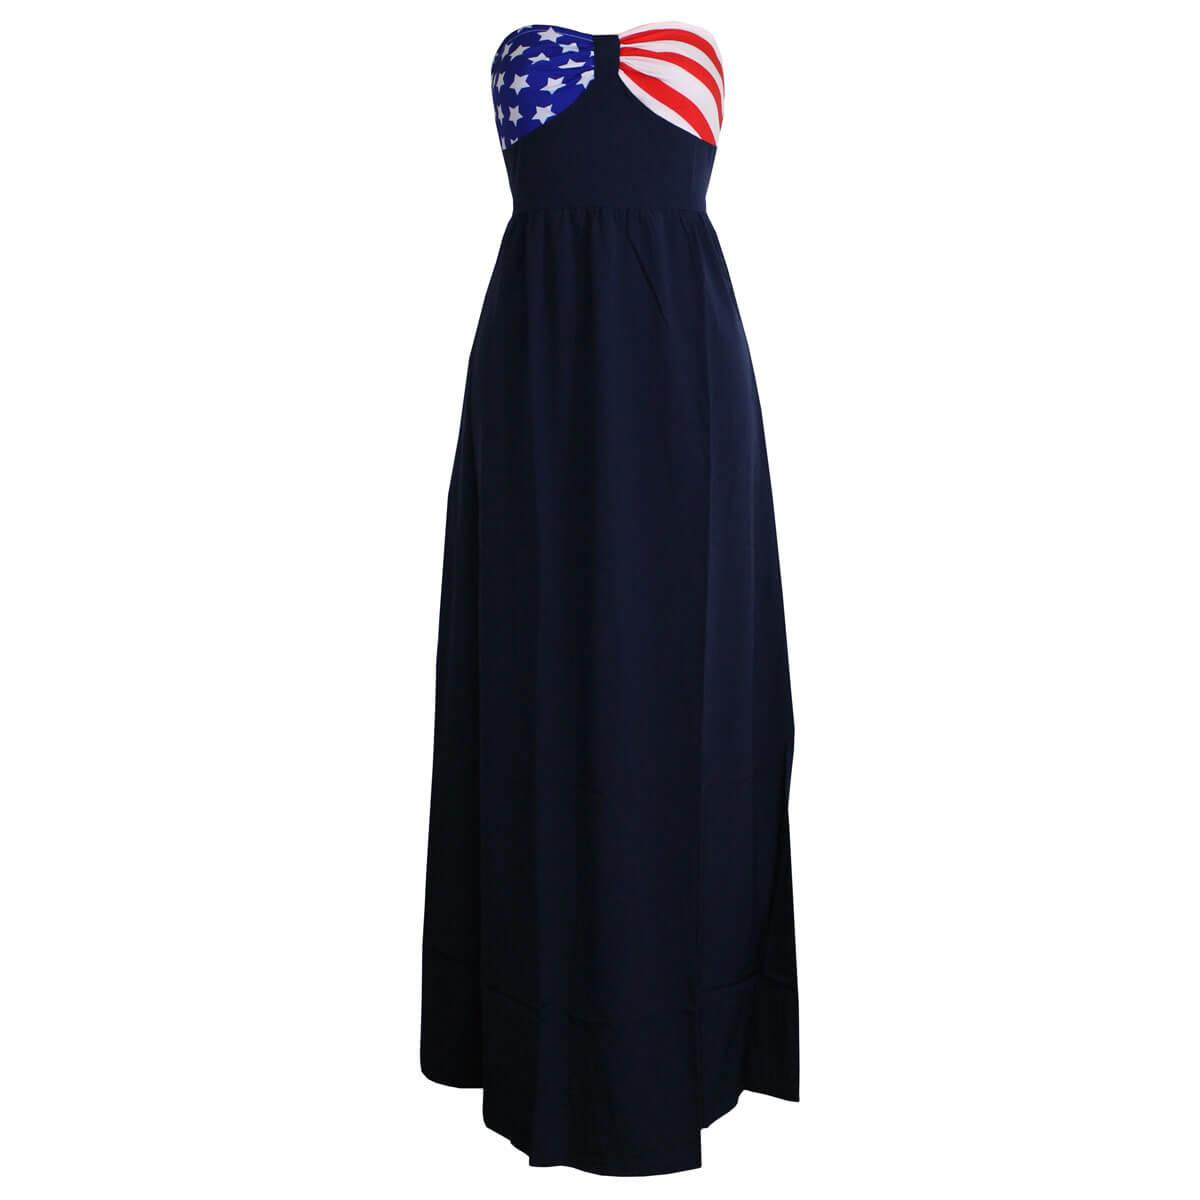 c0d0ed54036 Patriotic Strapless Maxi Dress (Small)